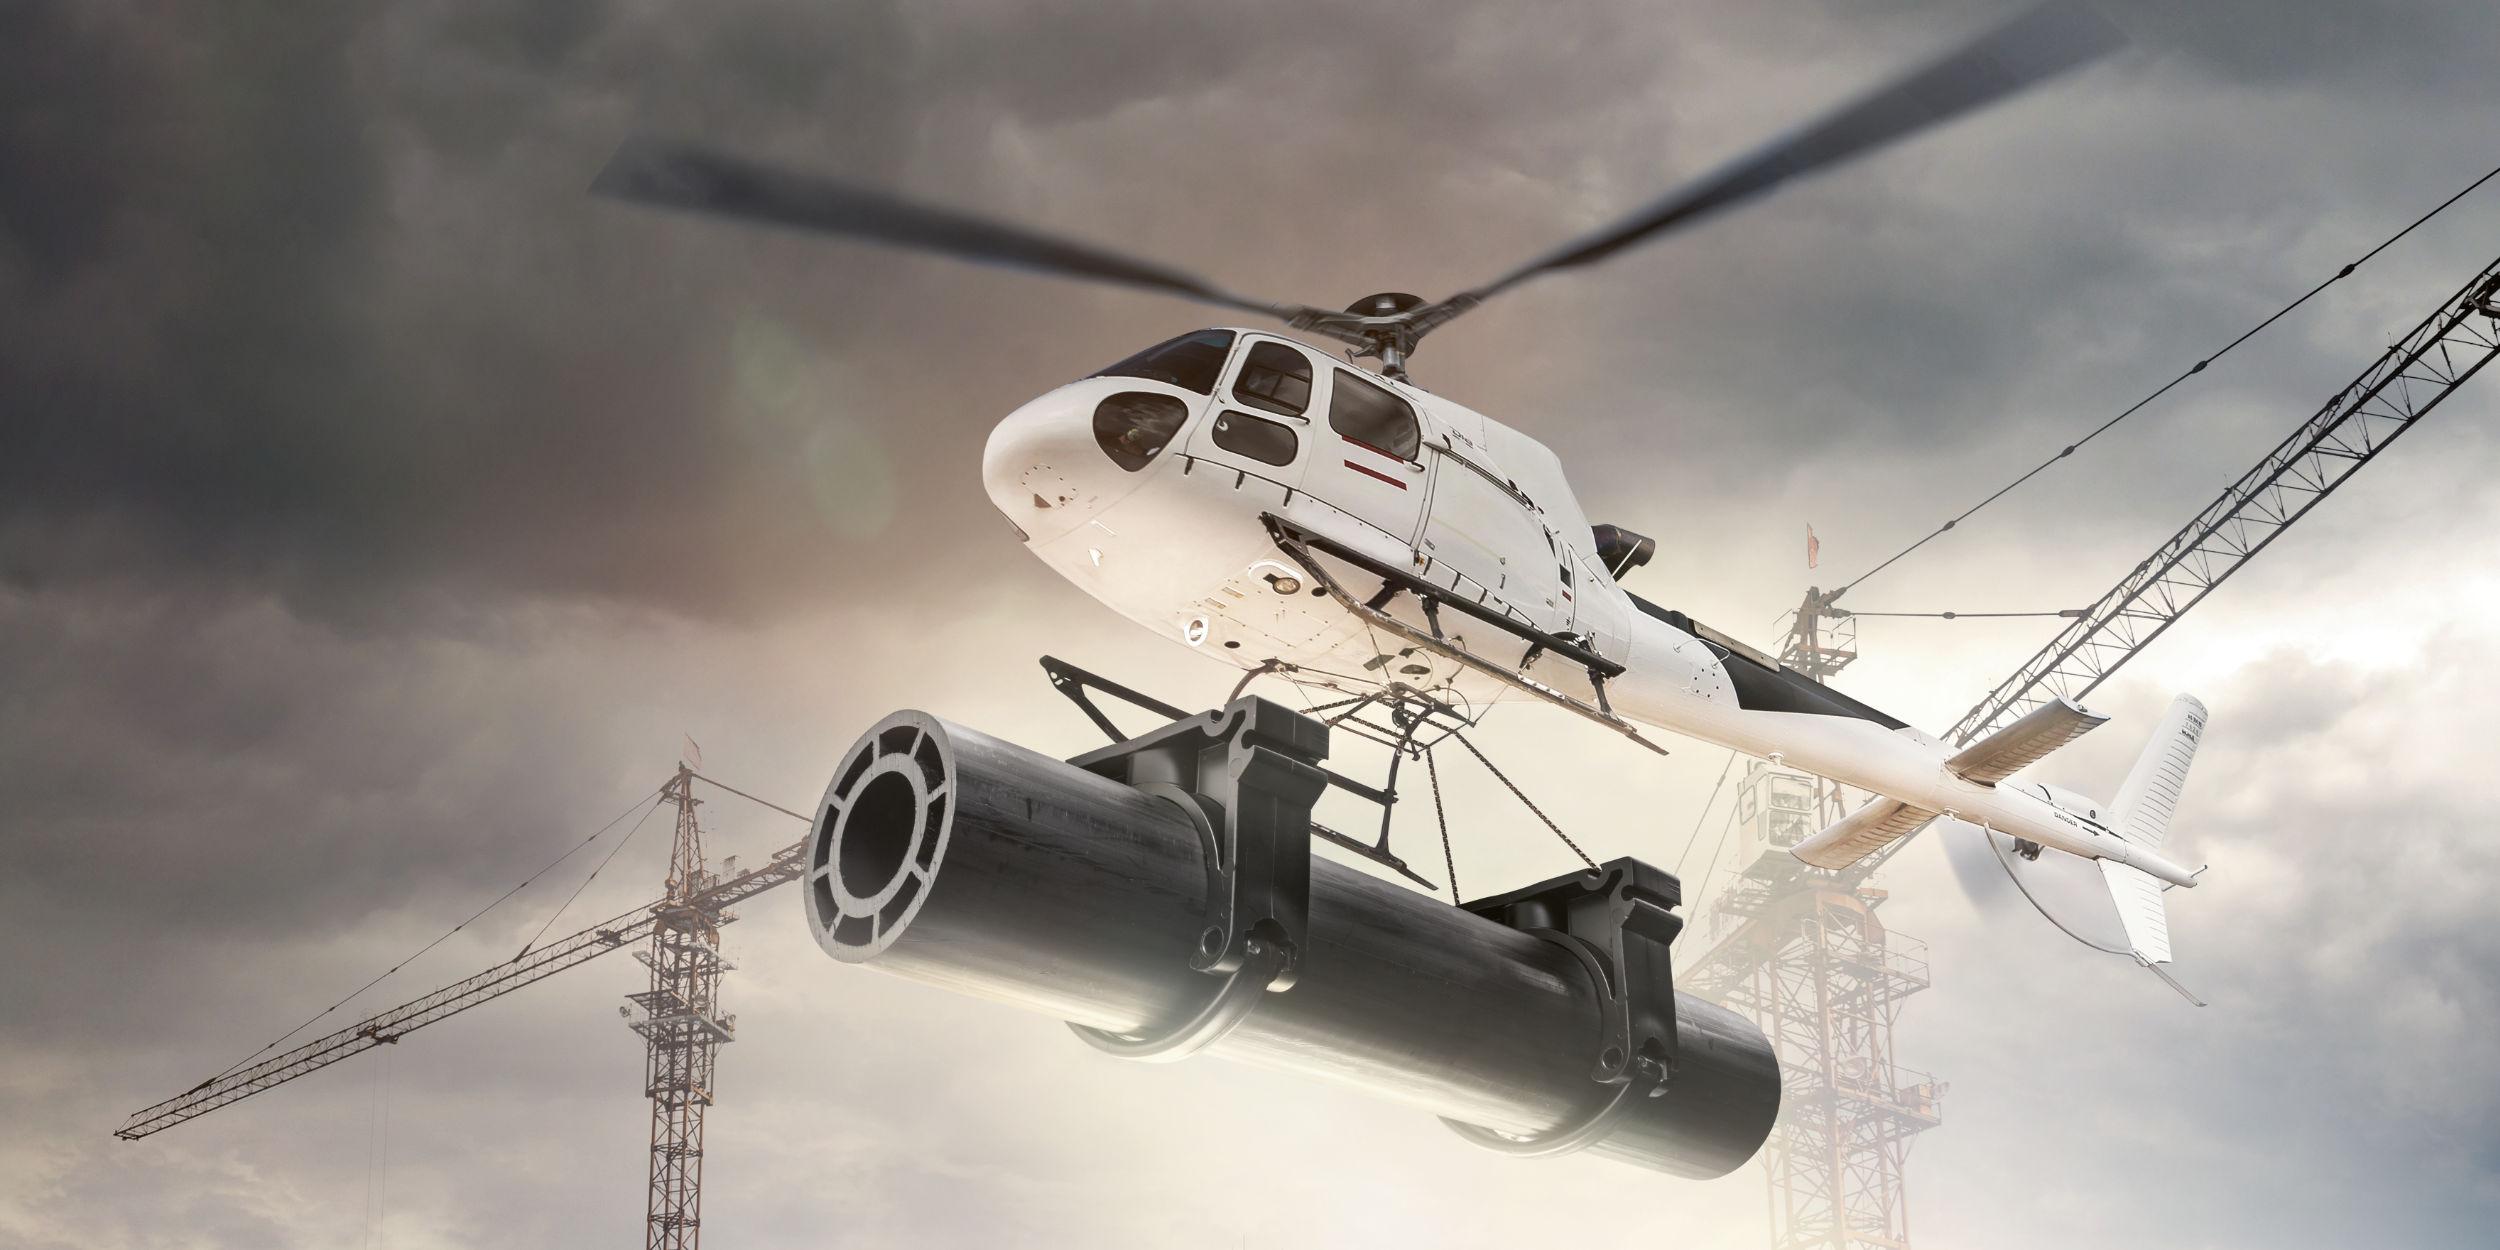 Kampagnen Fotografie Fellbach Stuttgart und Umgebung W52 JM Jäger Technology To Connect Helikopter Plastikrohr Baukräne Transport